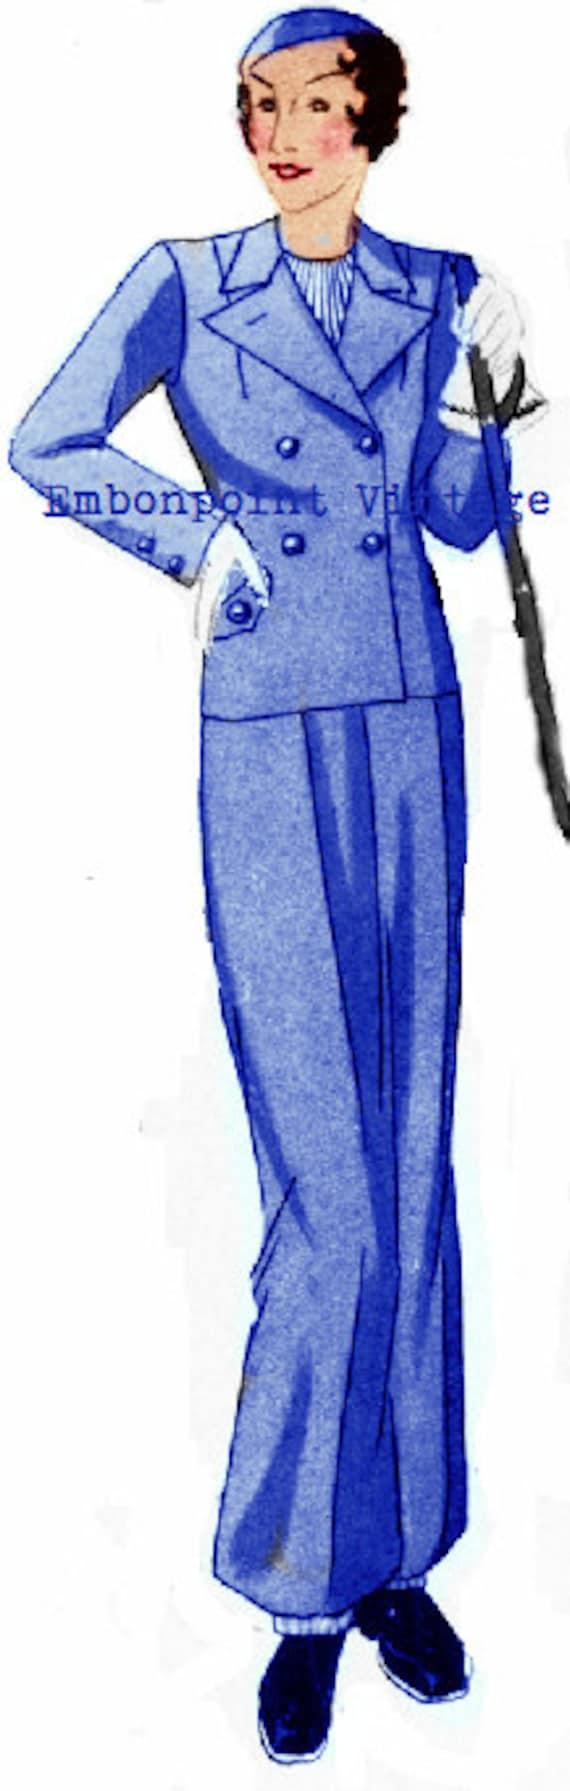 1930s House Dresses Plus Size Pattern (or any size) Vintage 1934 Skirt Suit - PDF - Pattern No 107 Earlene 1930s 30s Pattern  AT vintagedancer.com